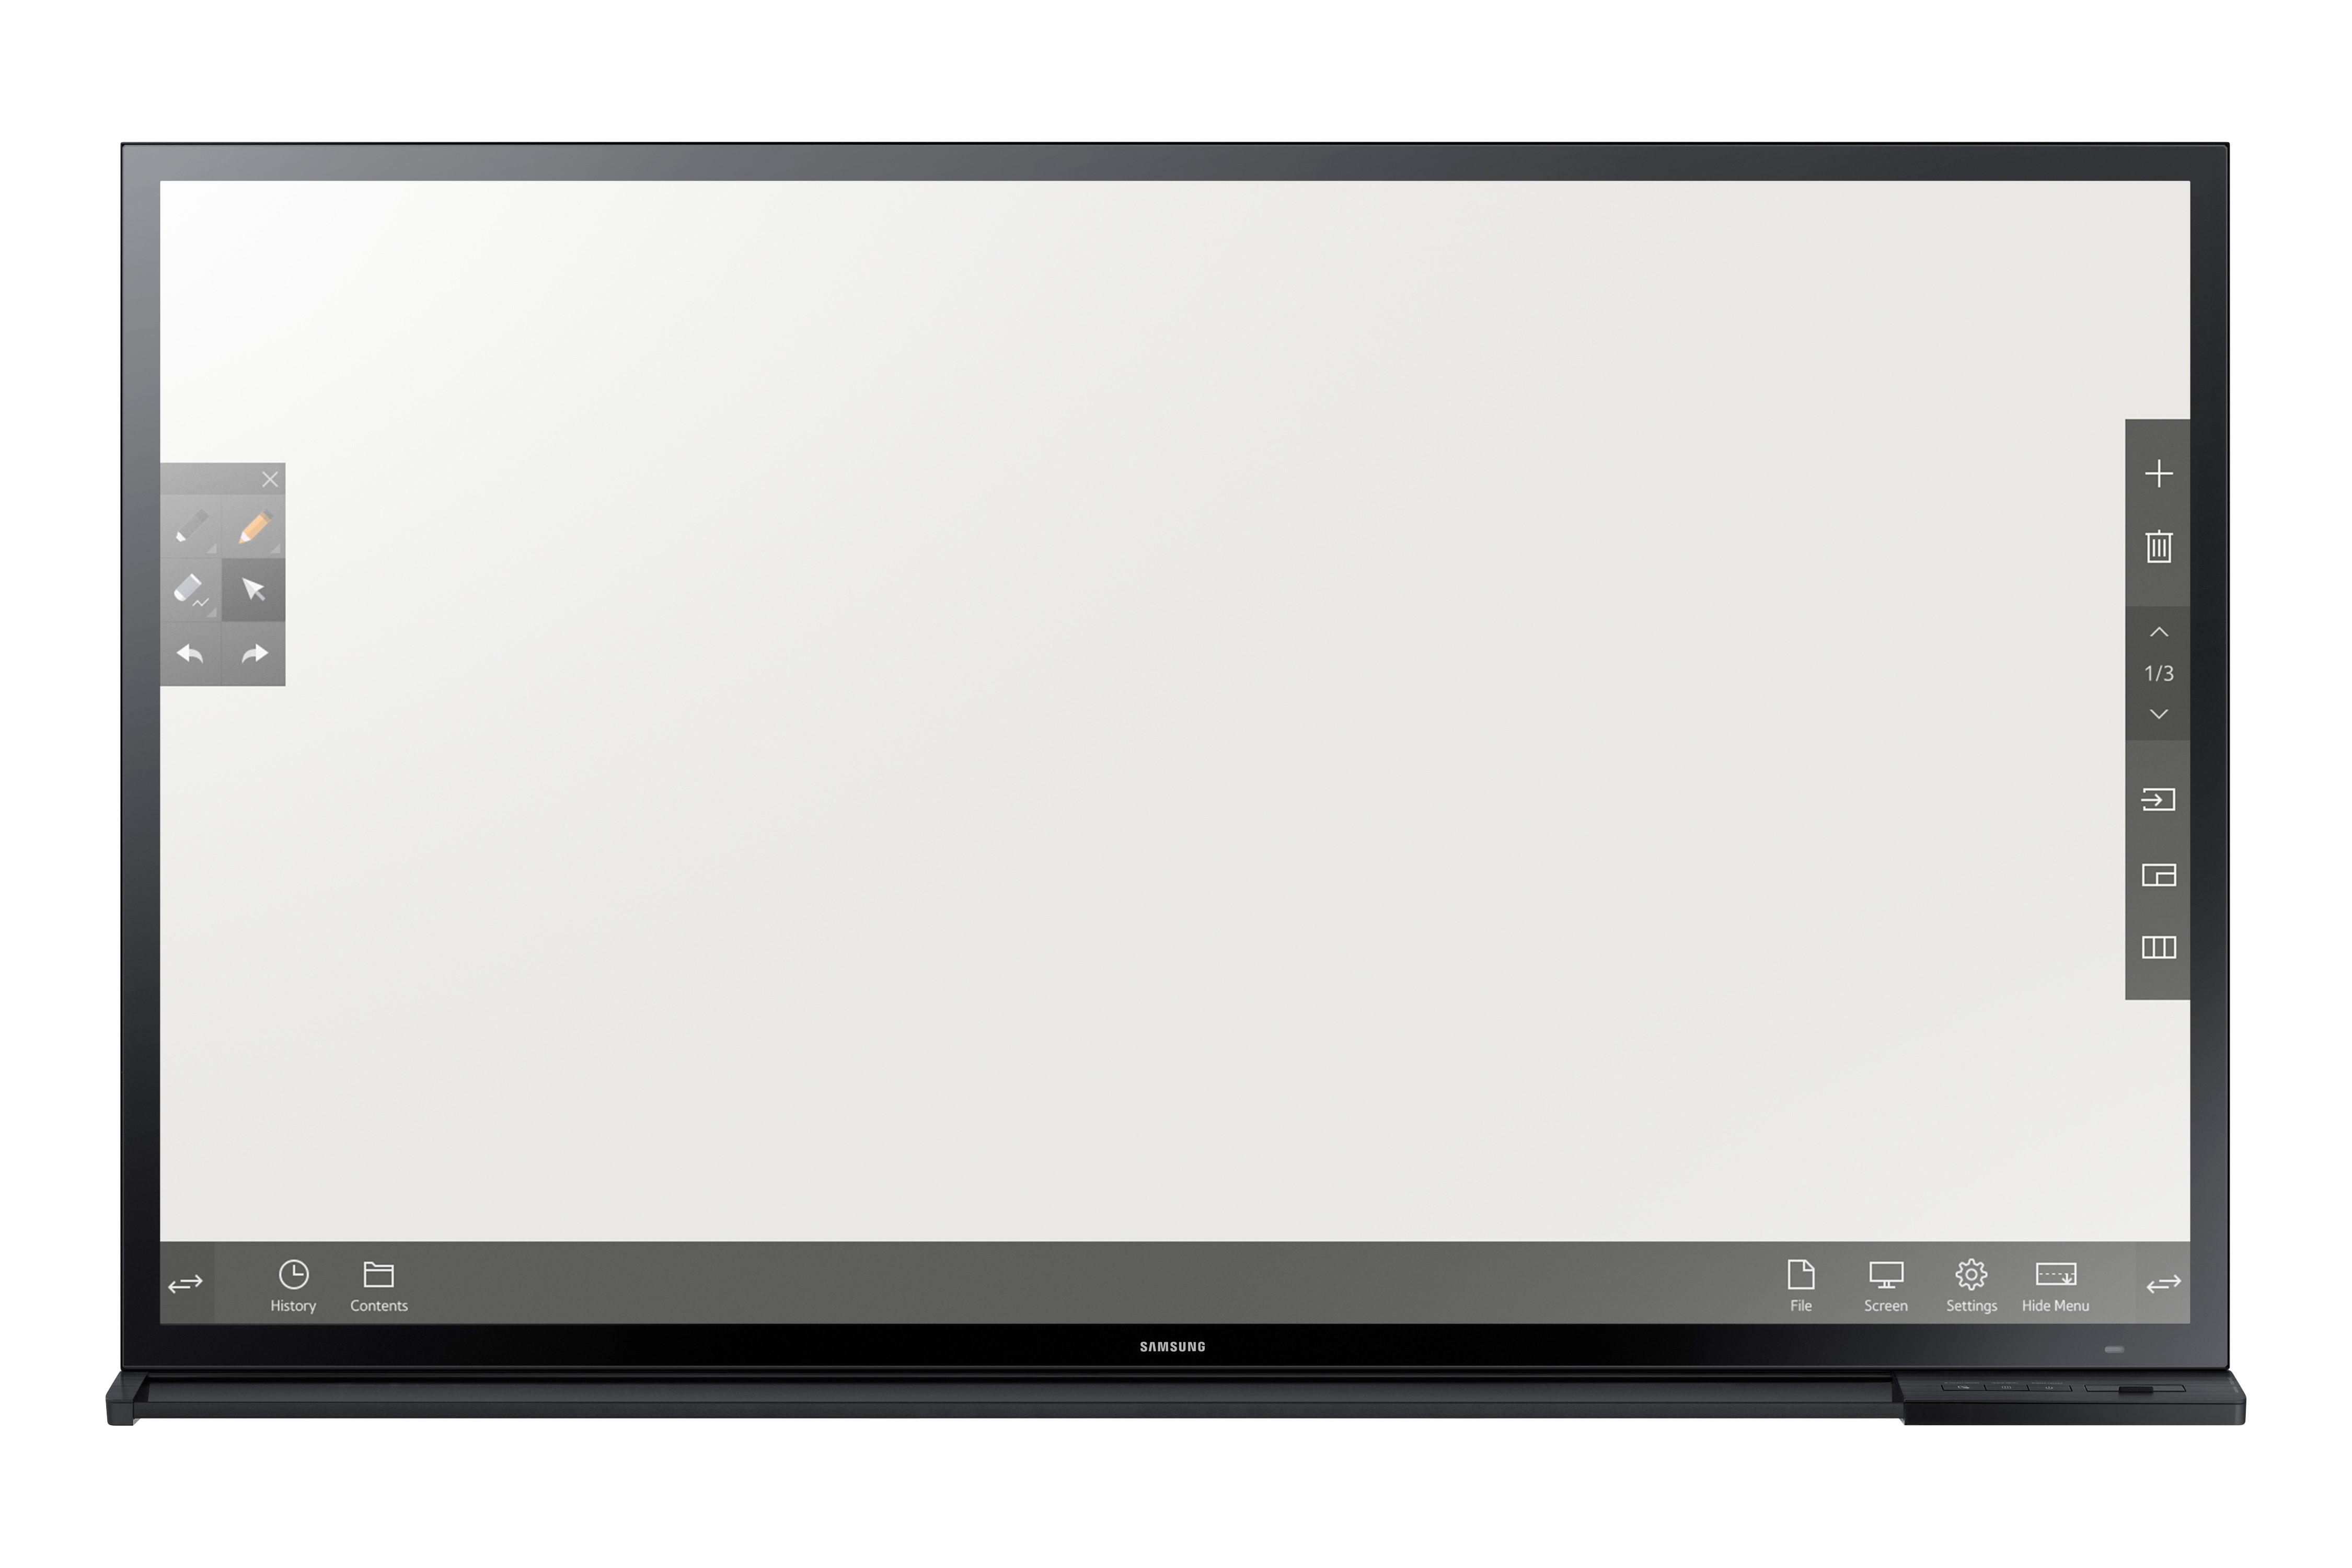 Samsung_DM65E-BC_front